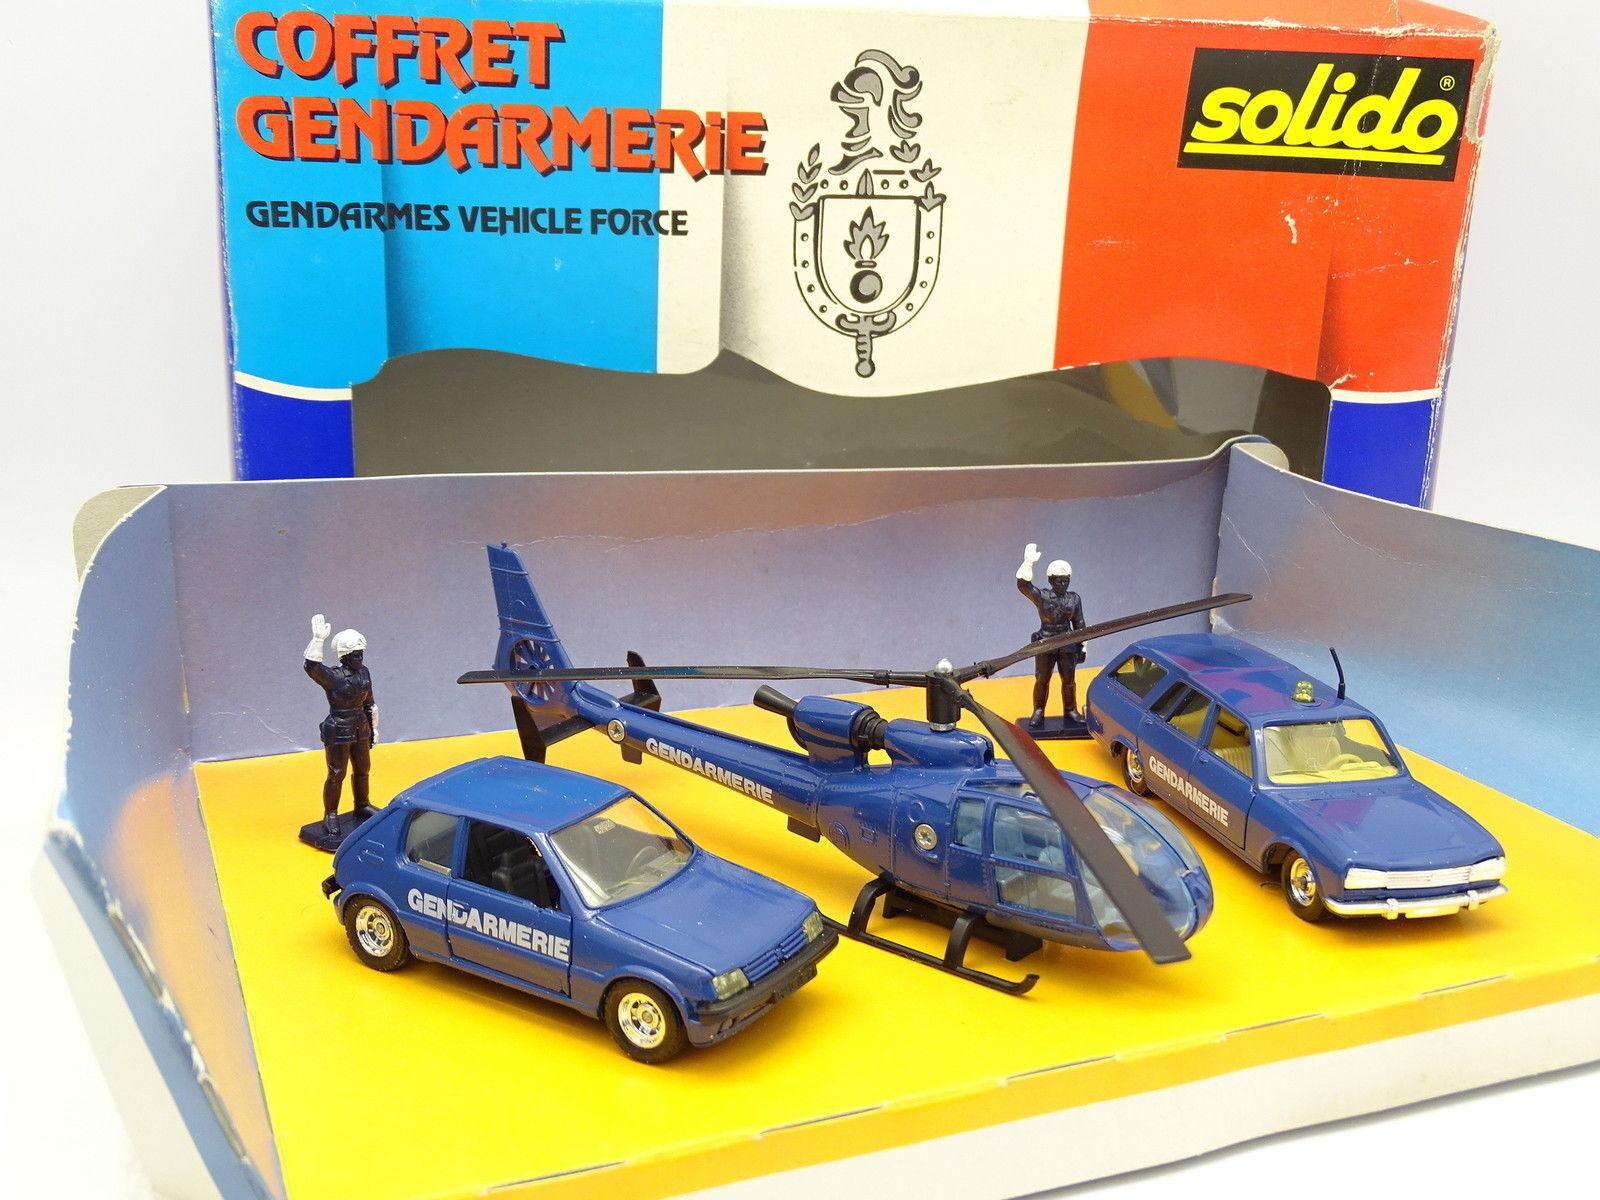 Solido 1 43 - Boxset Police - Peugeot 205 - 504 Break - Helicopter